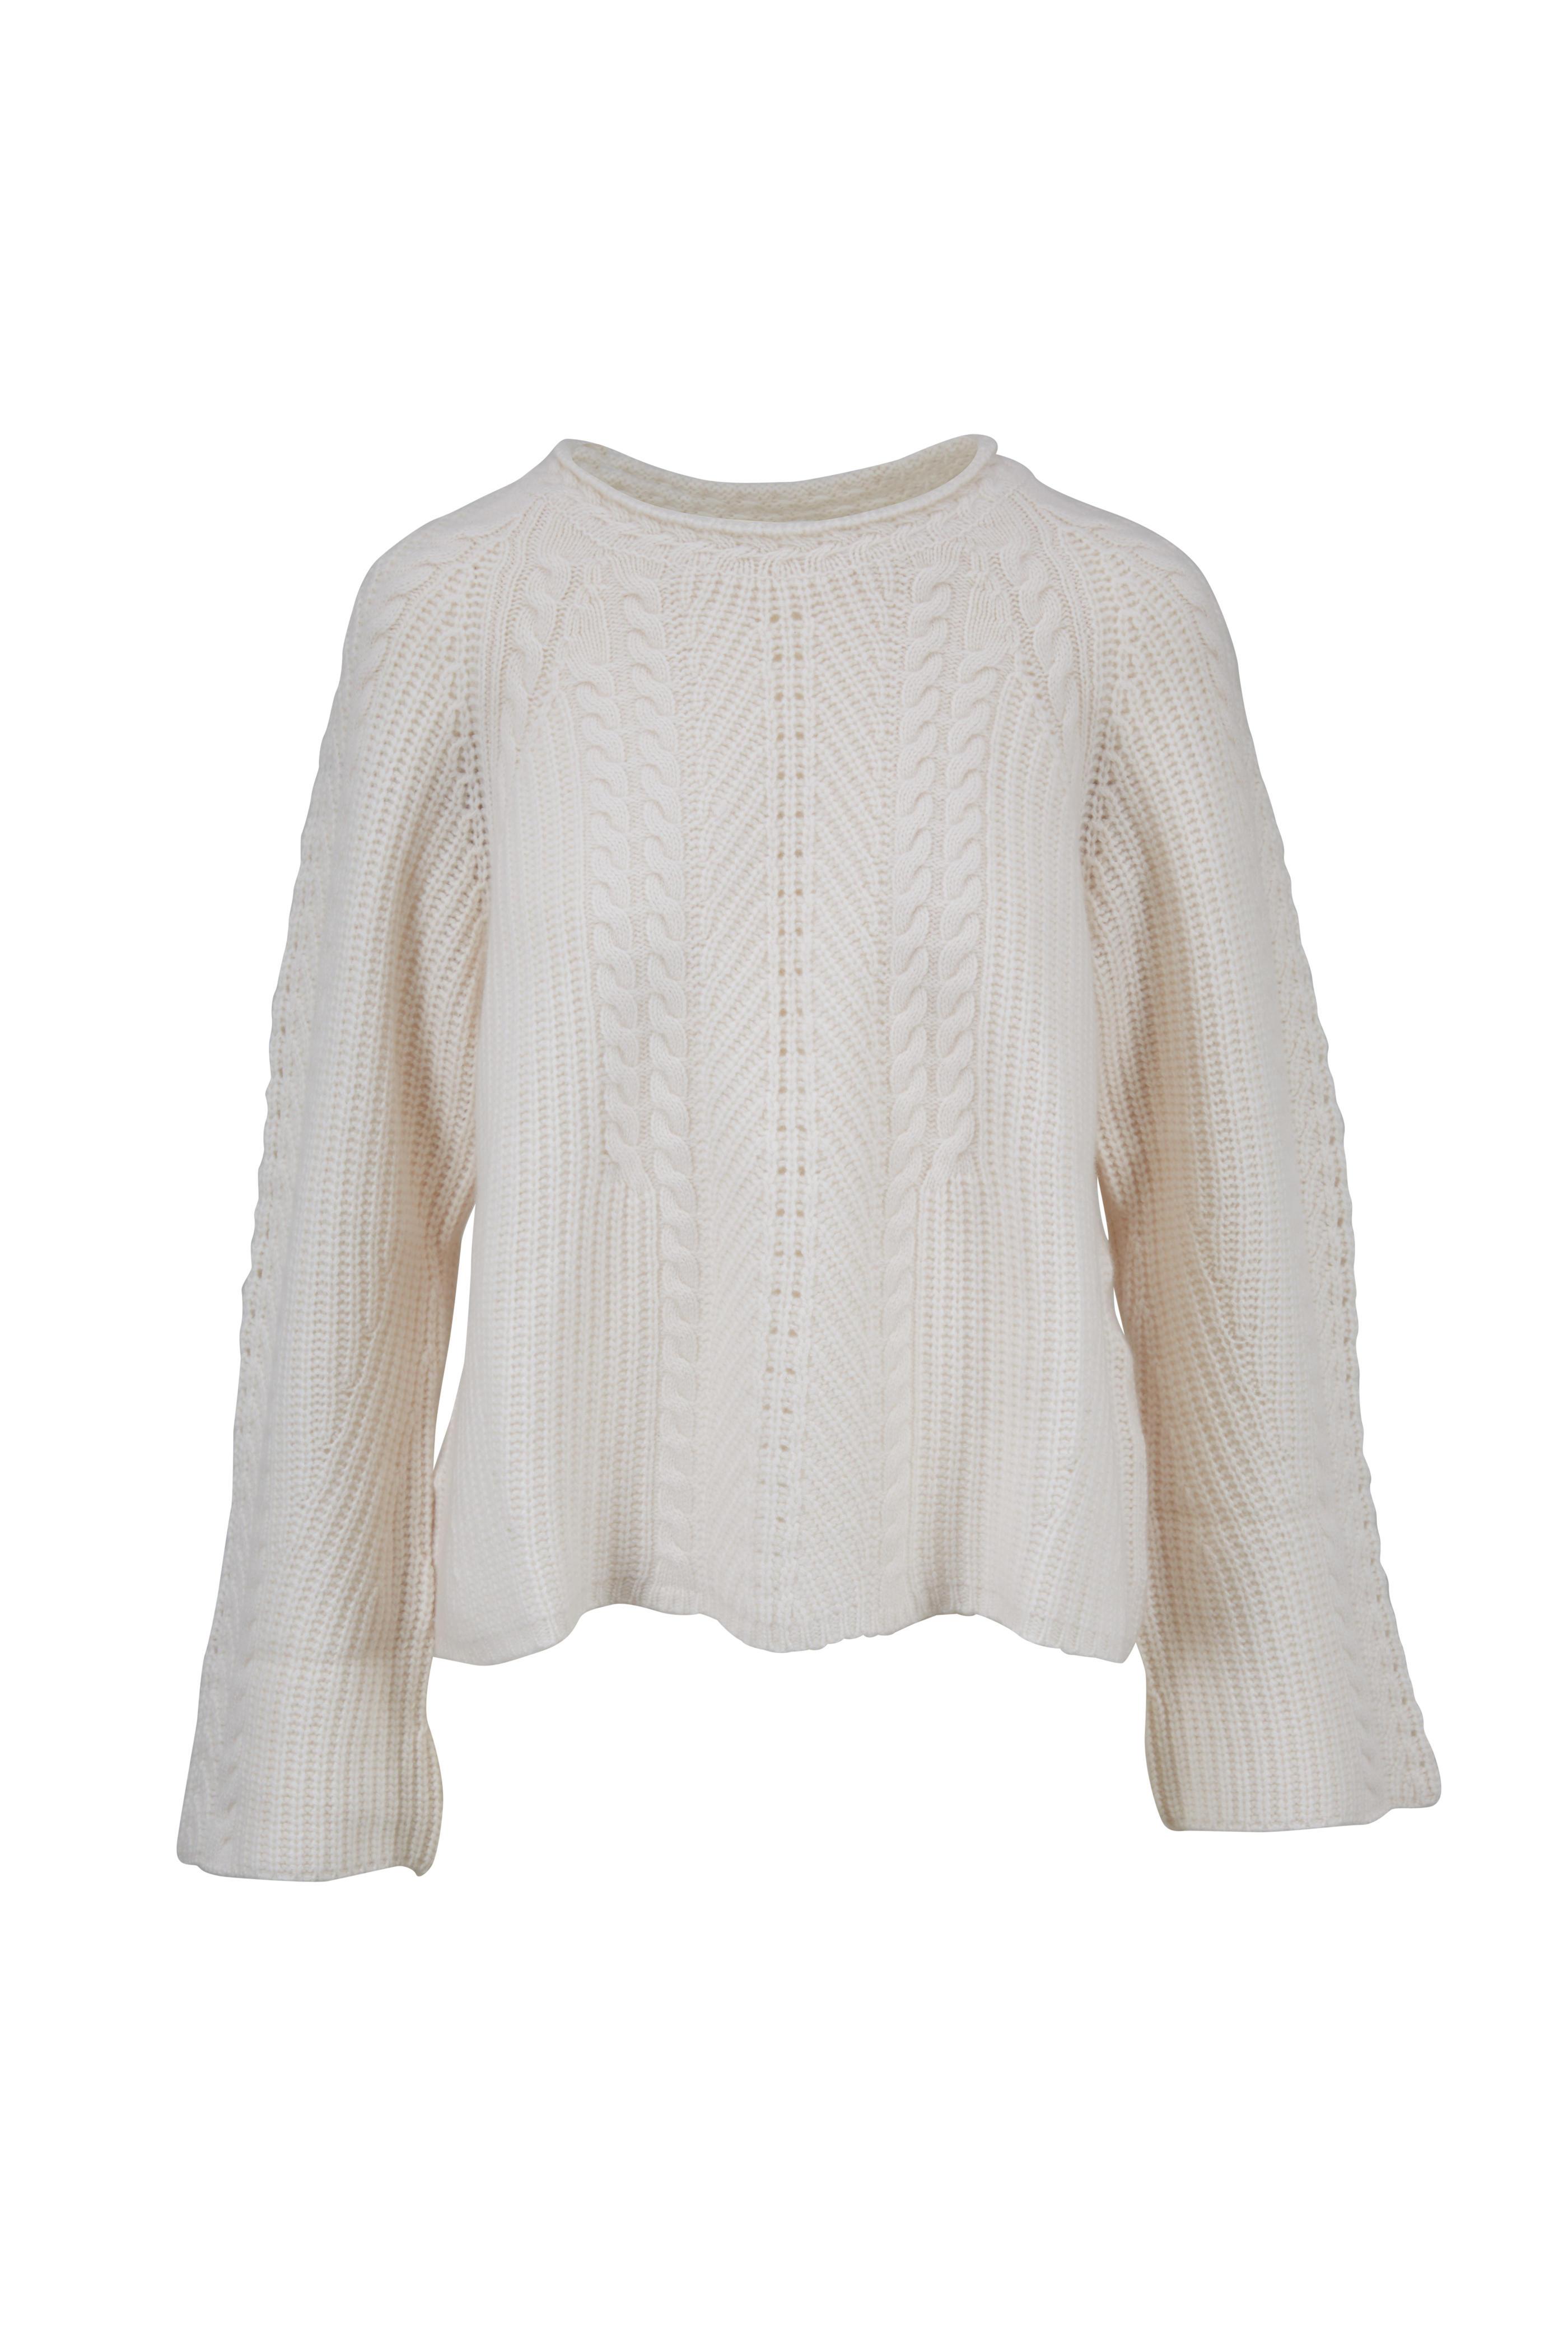 e7485ec92183 Le Kasha - Grenade White Cashmere Cable Knit Sweater